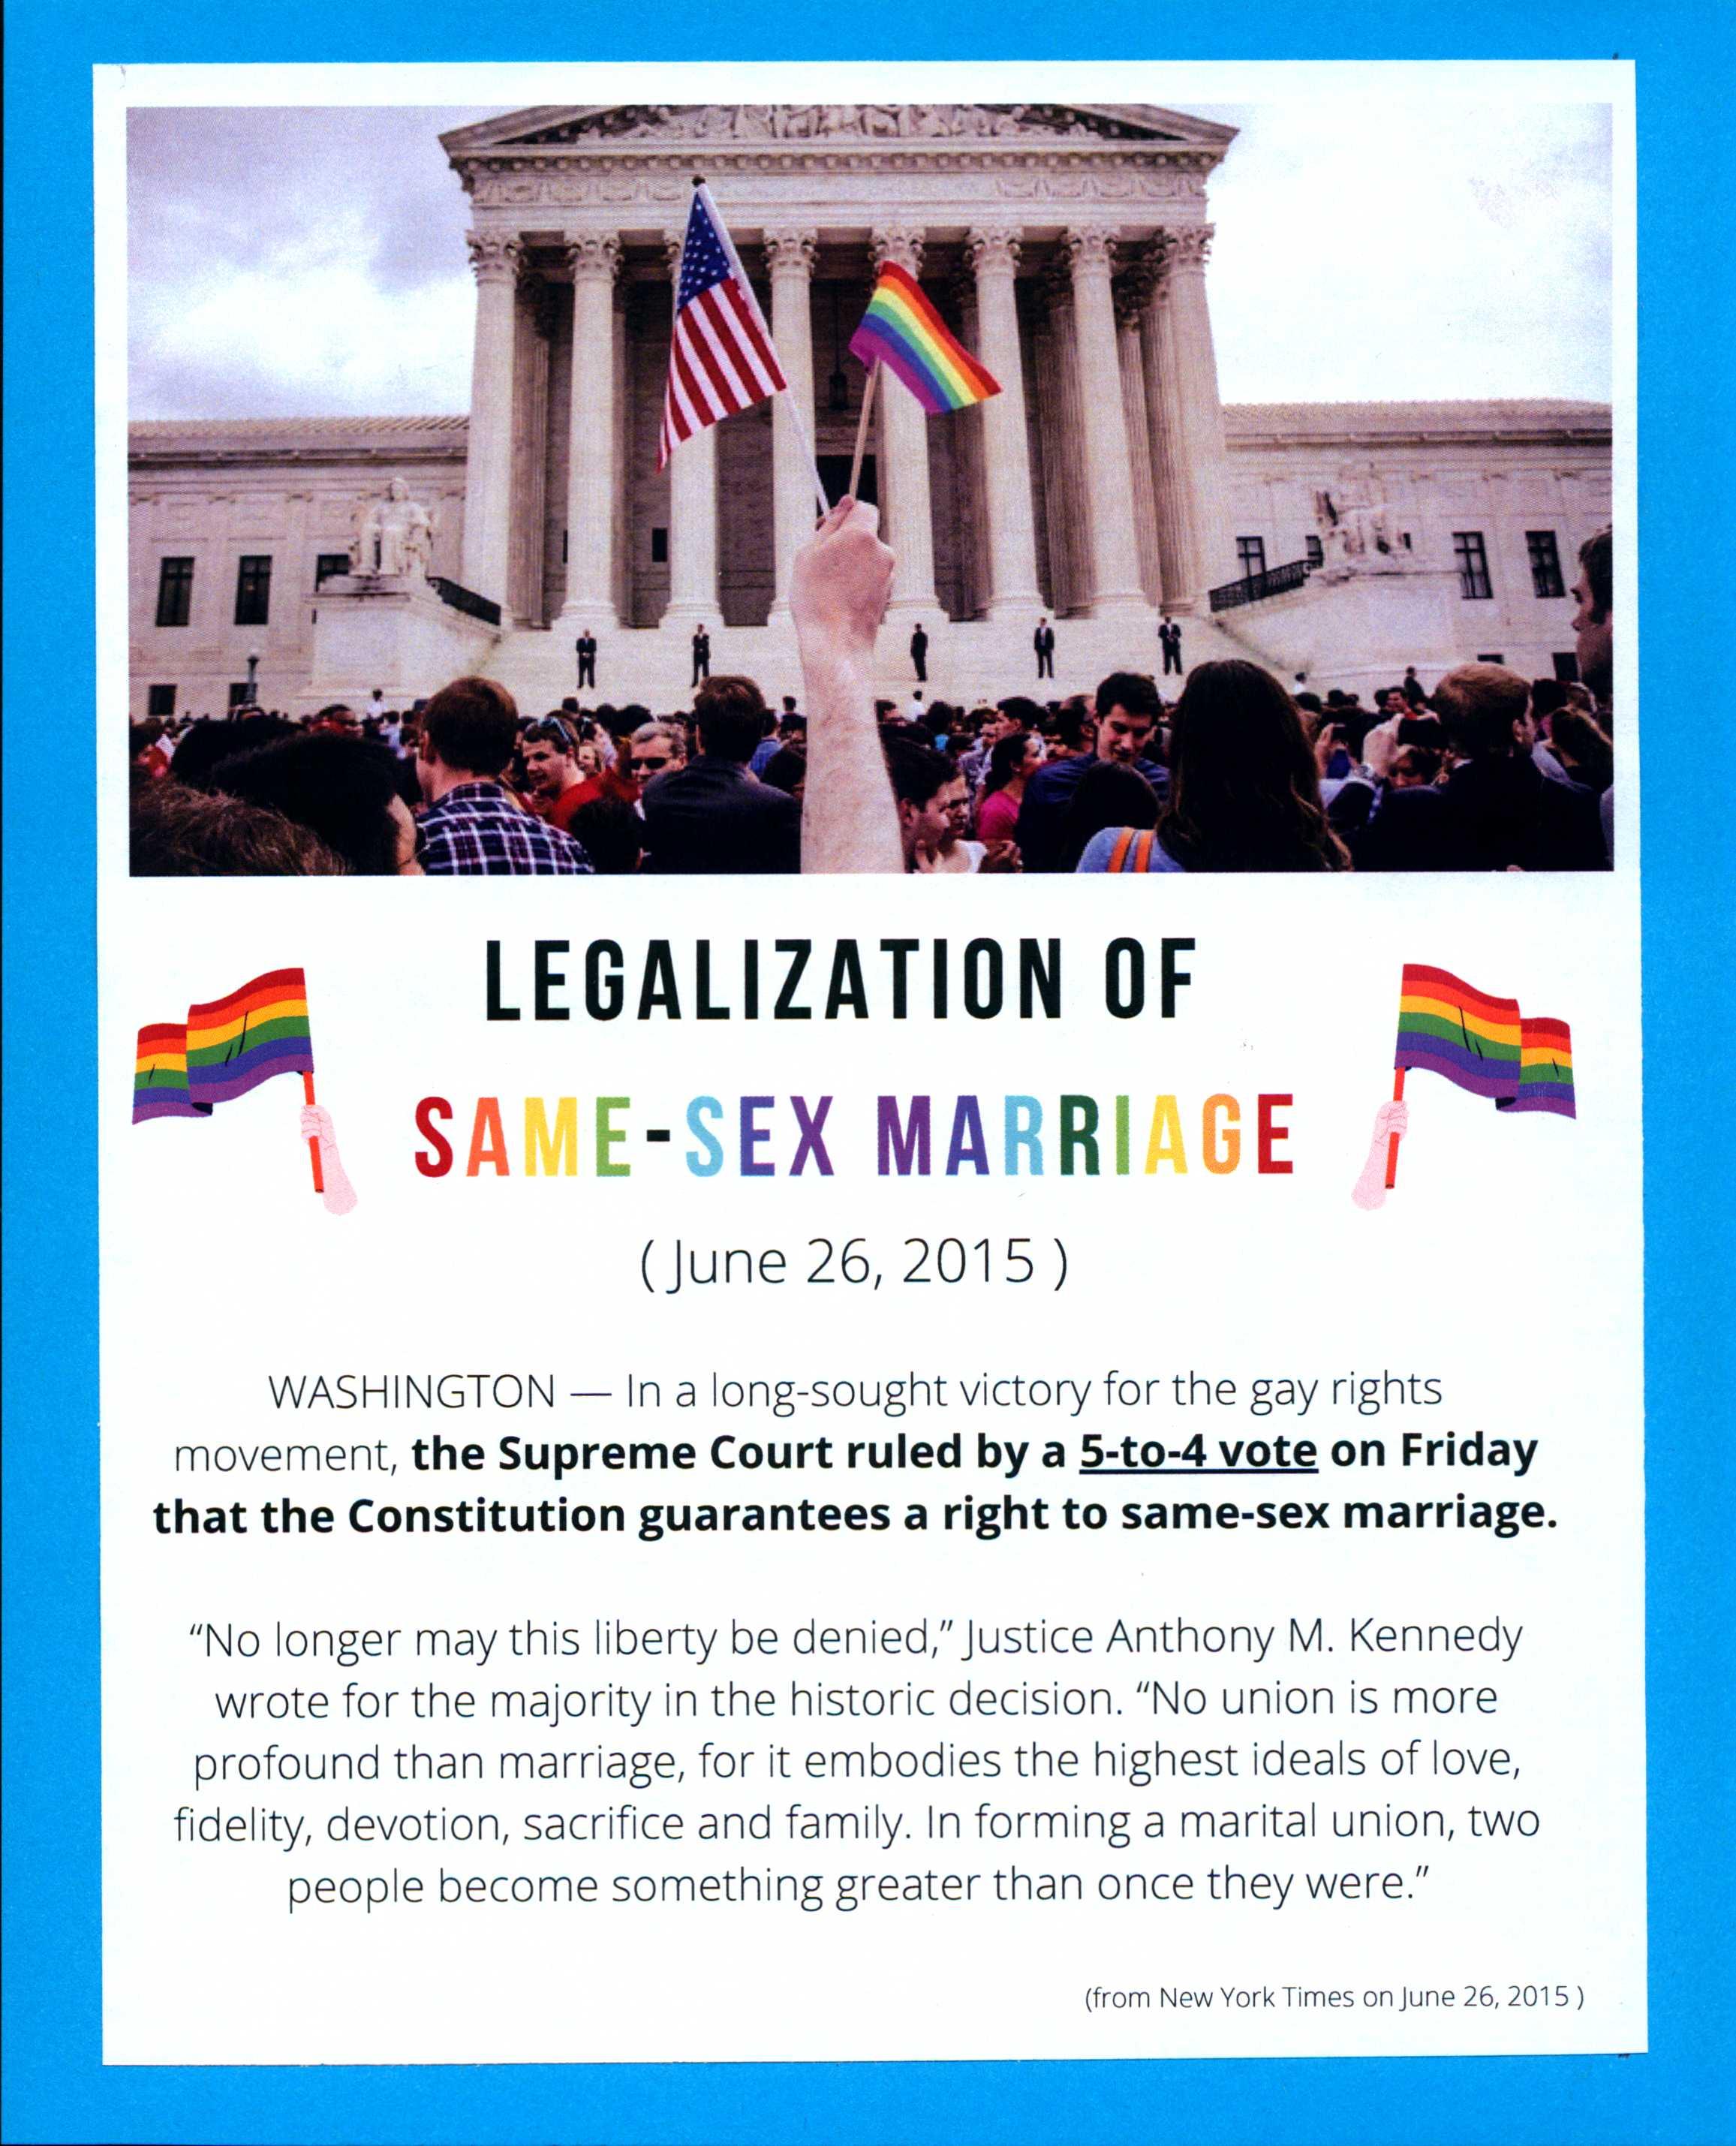 Legalization of Same-Sex Marriage Information Art